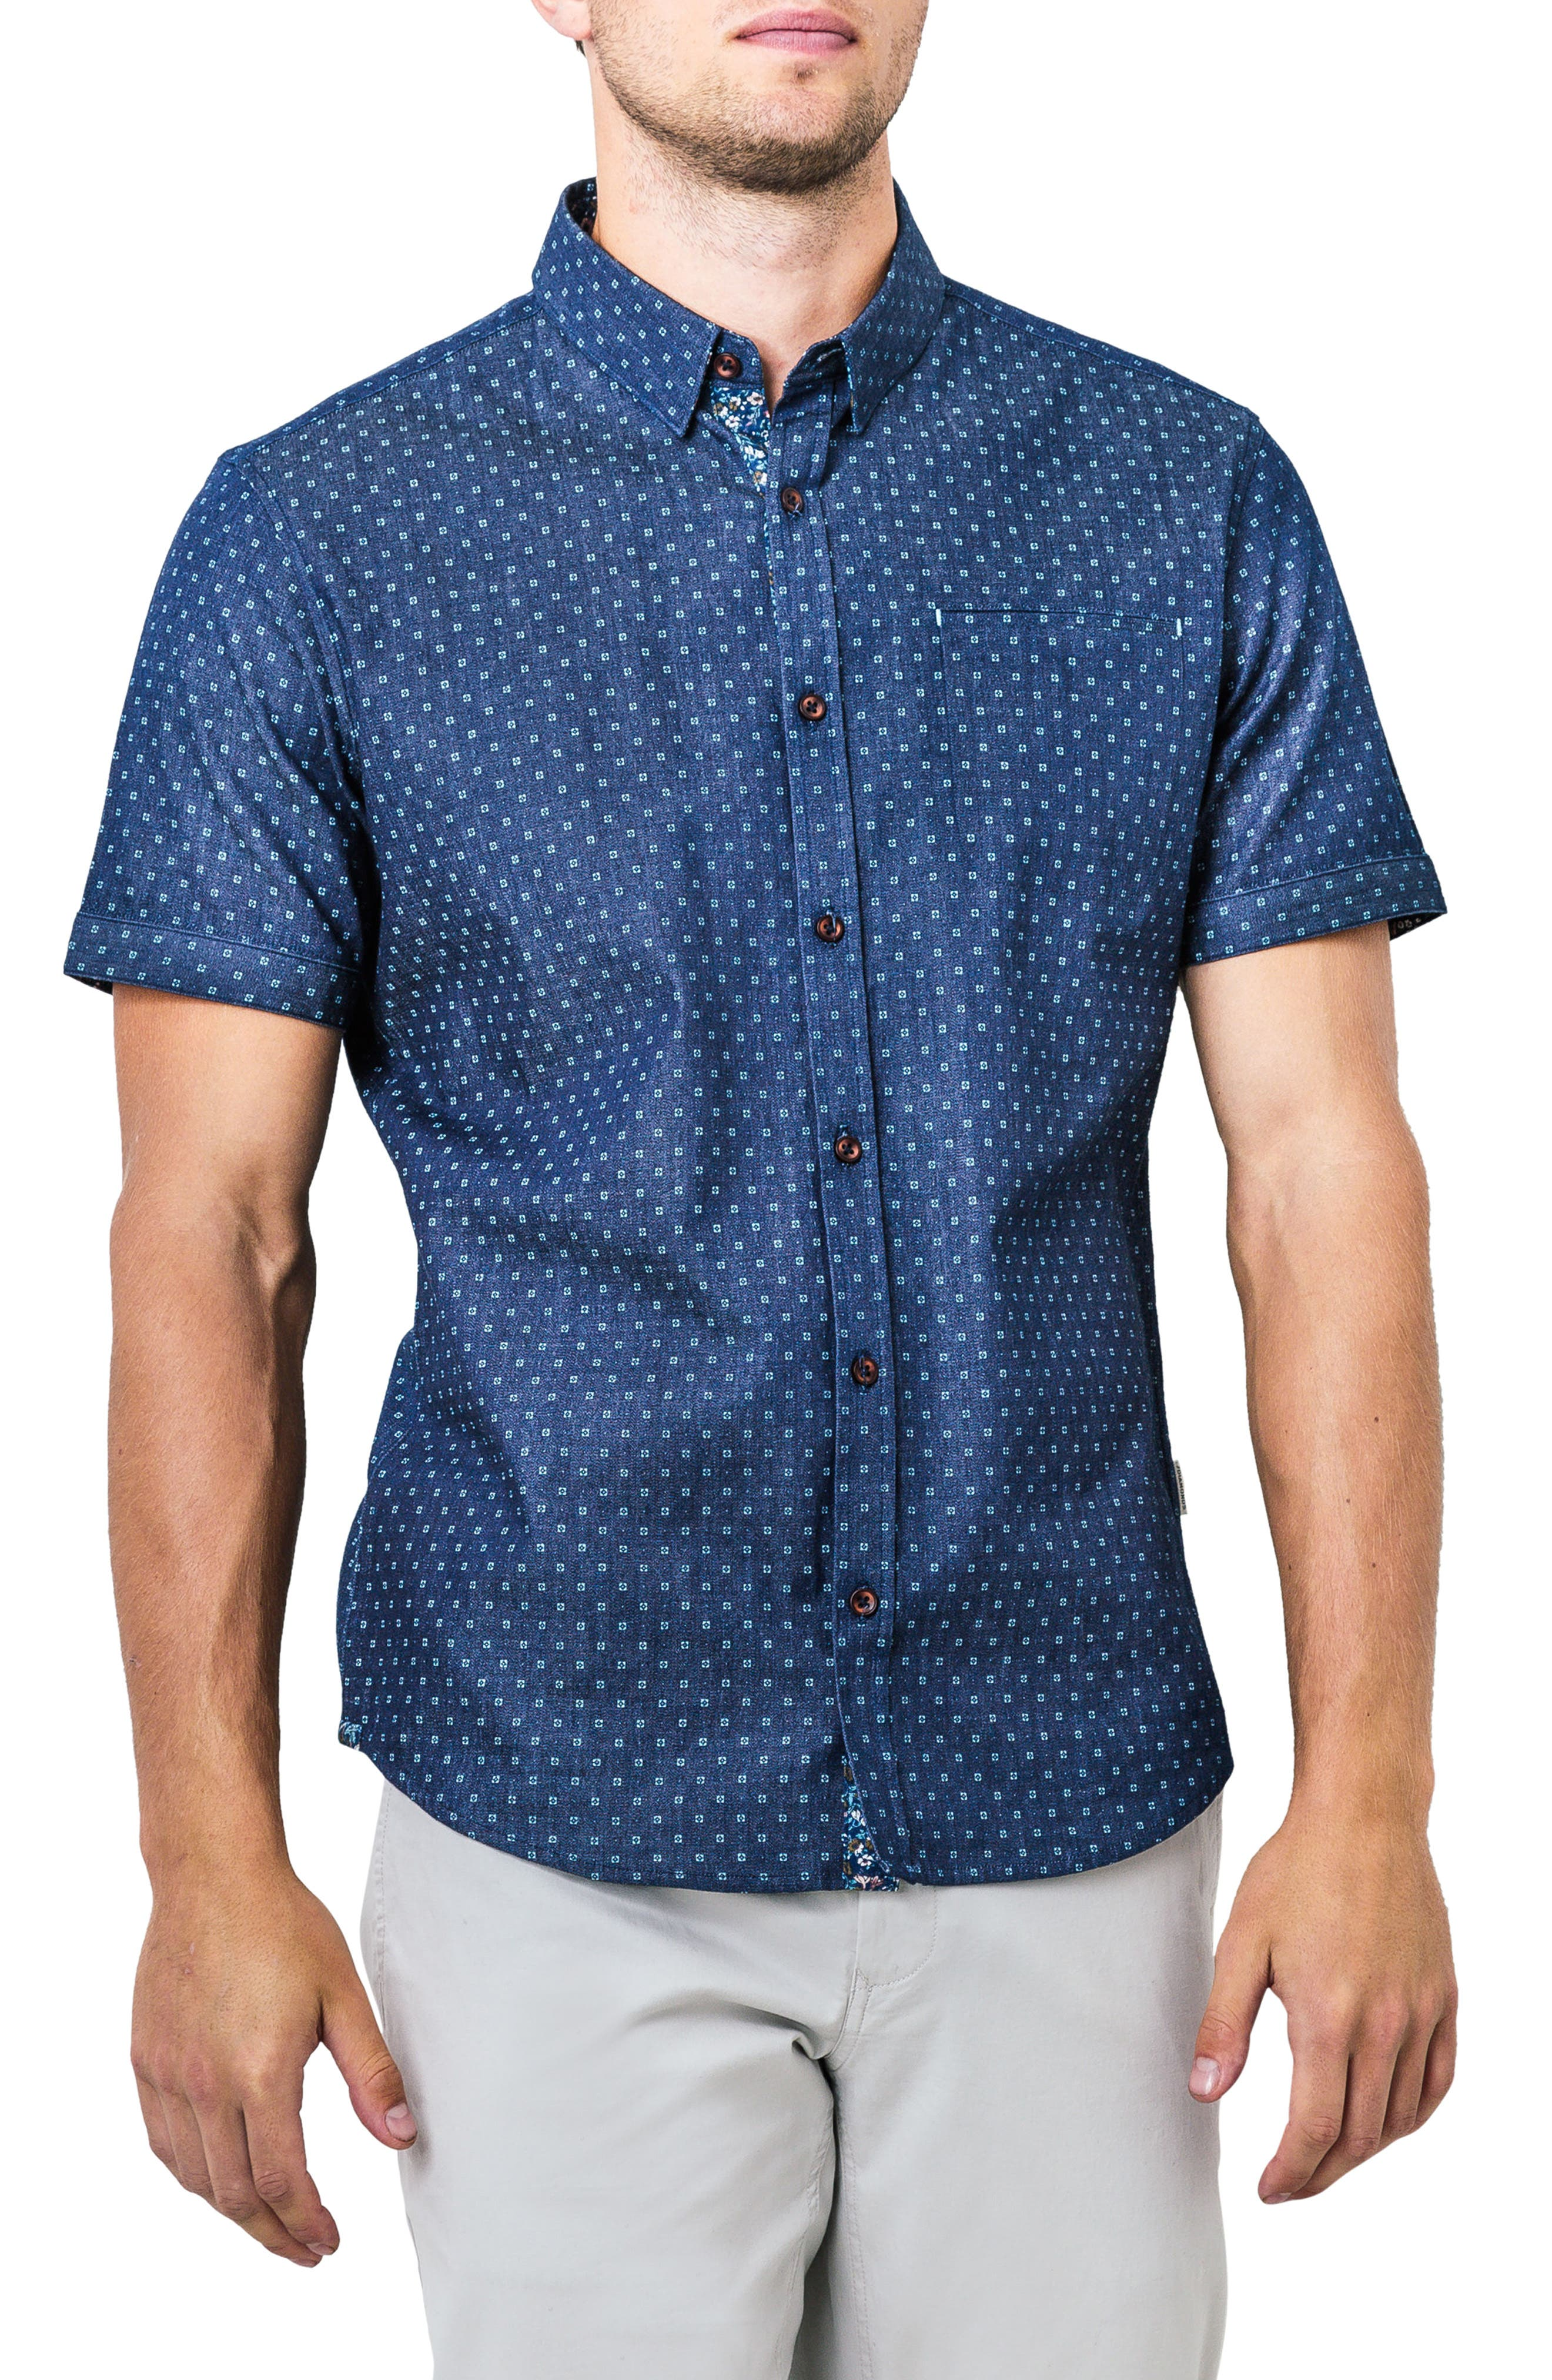 7 Diamonds Innervision Woven Shirt